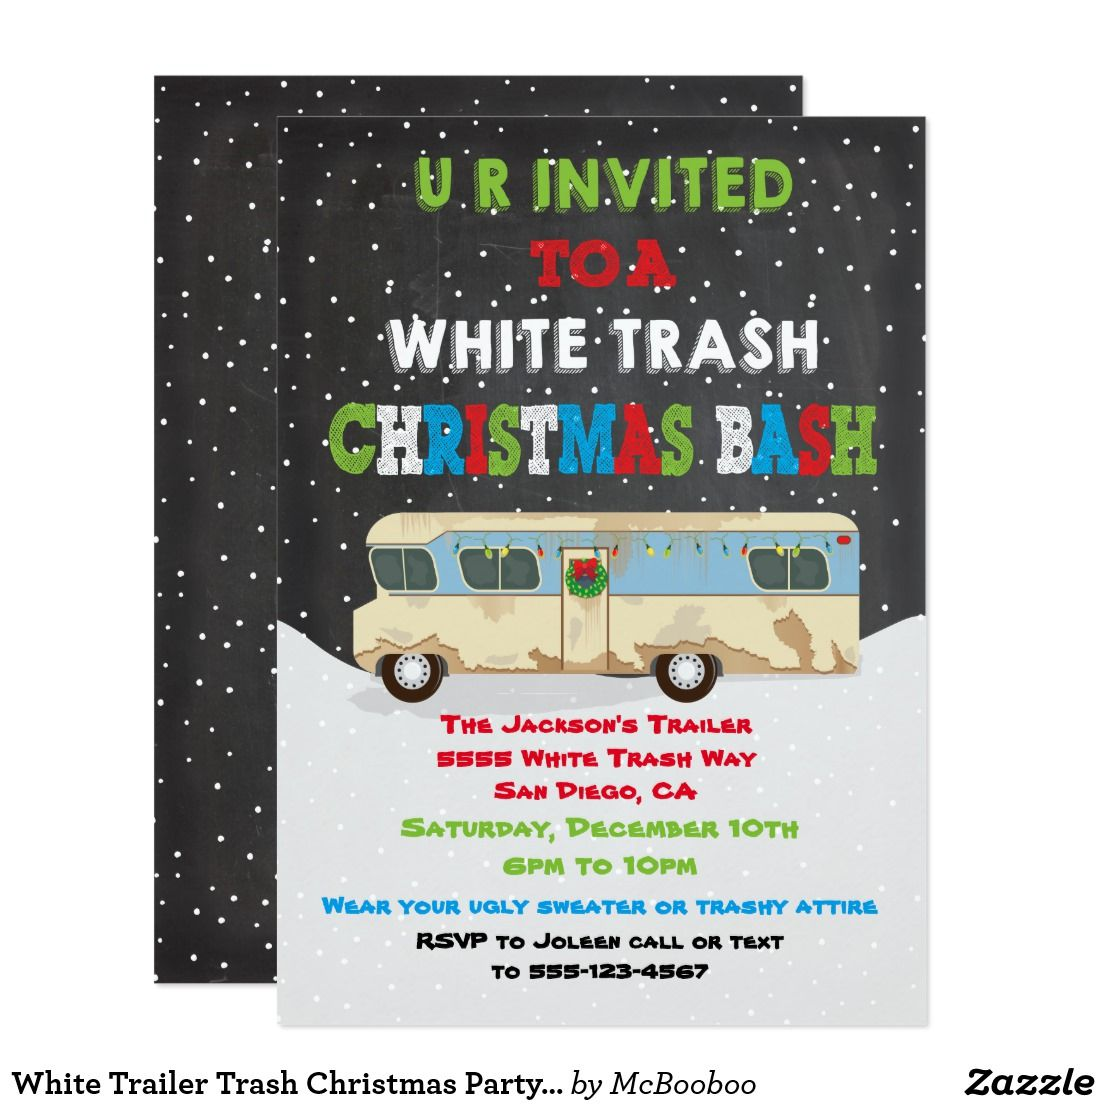 White Trailer Trash Christmas Party Bash Invitation in 2018 ...